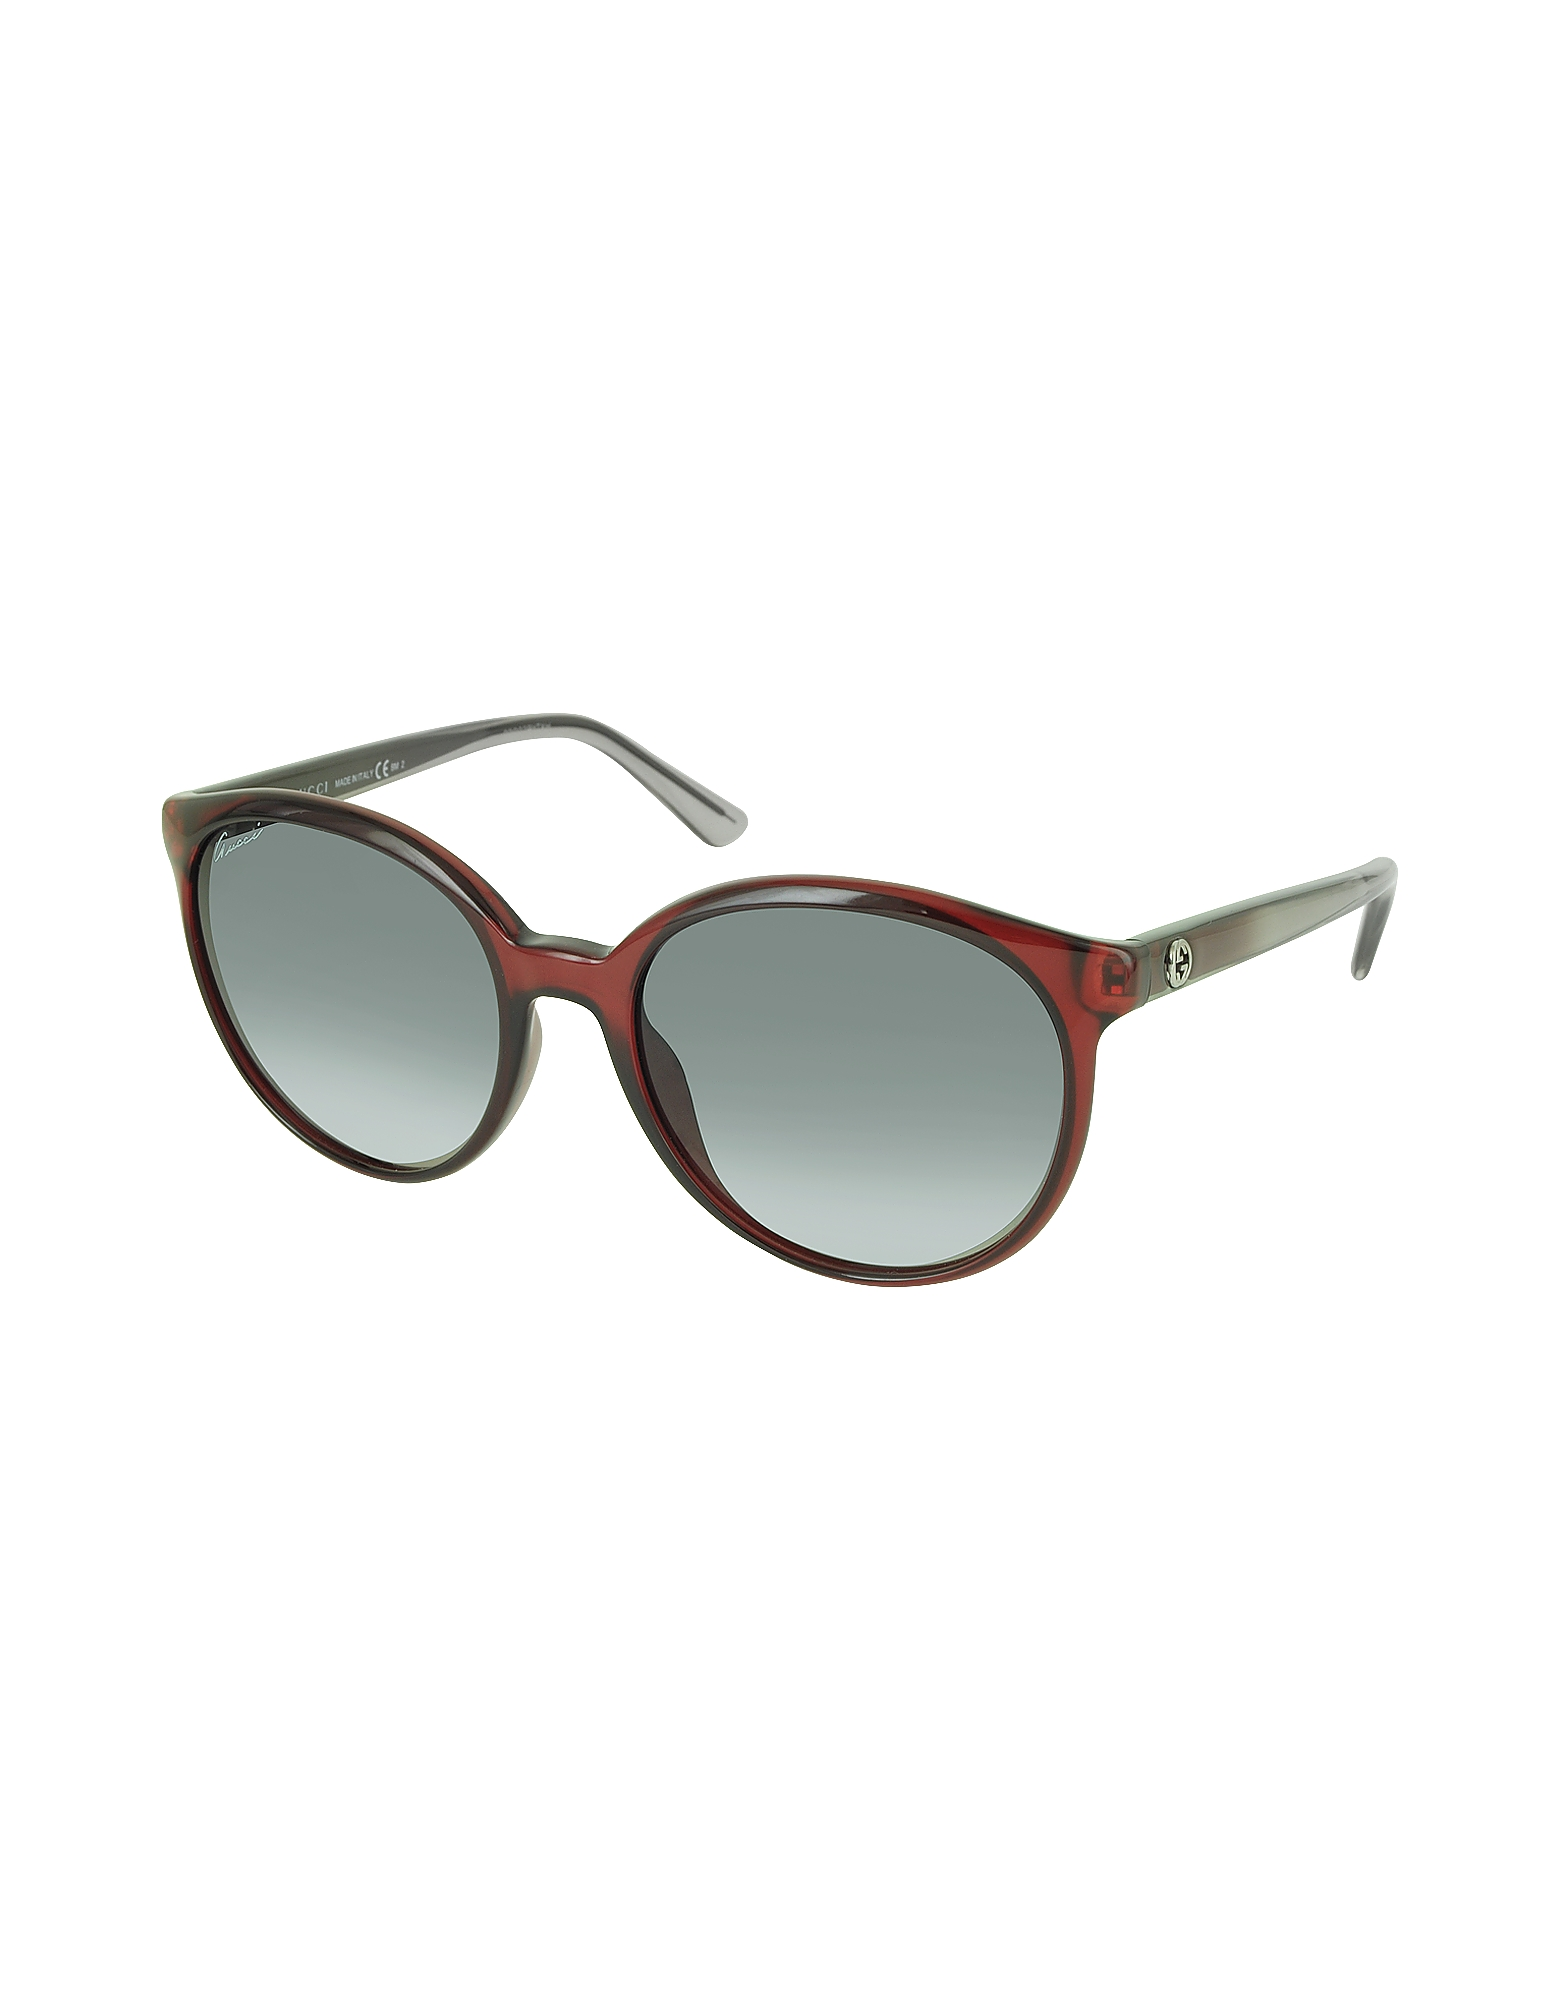 GG 3697/S IPUDX Round Havana Women's Sunglasses от Forzieri.com INT